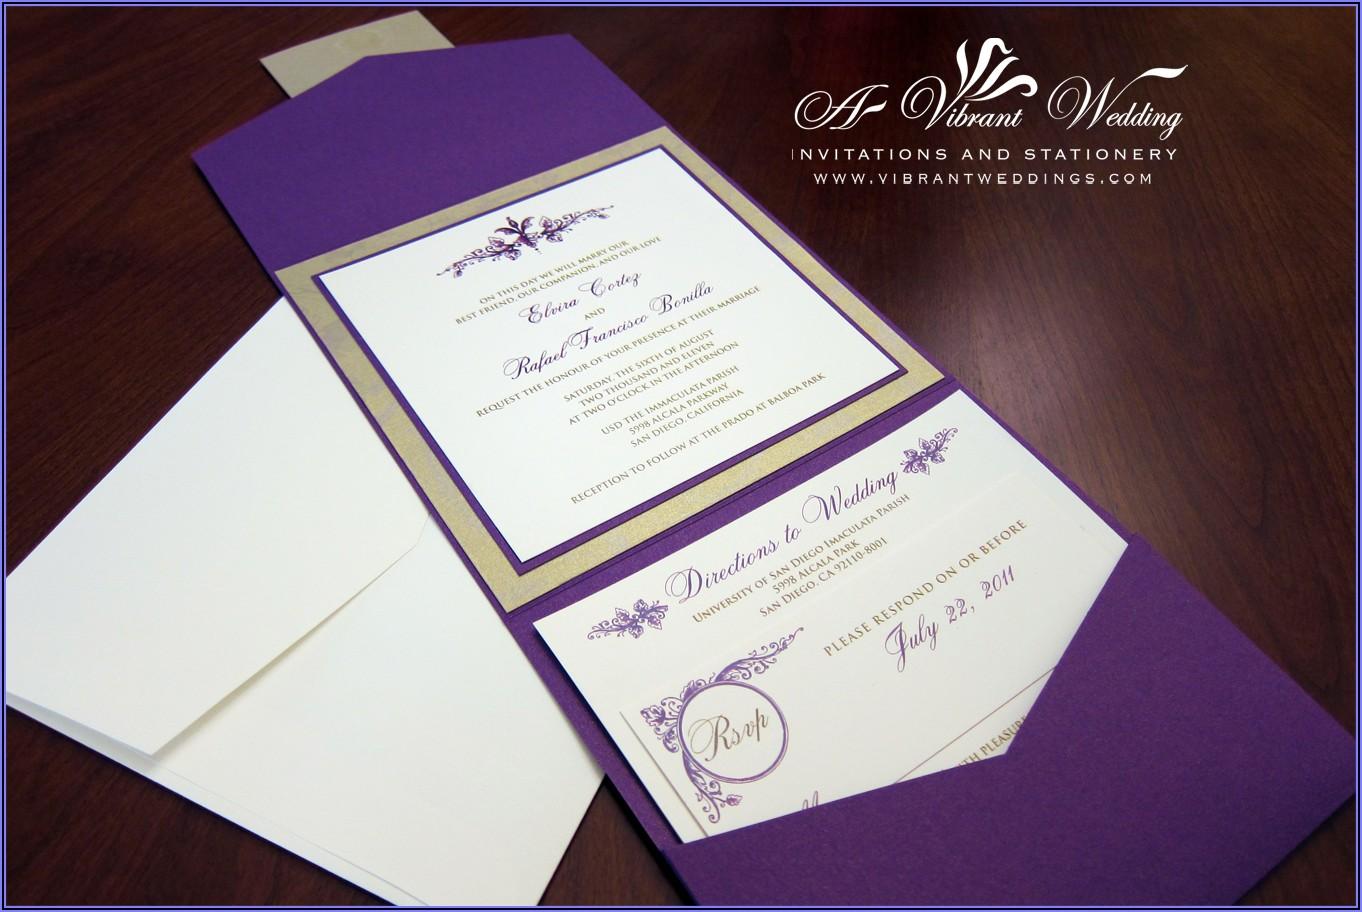 Wedding Invitation Design Software Free Download